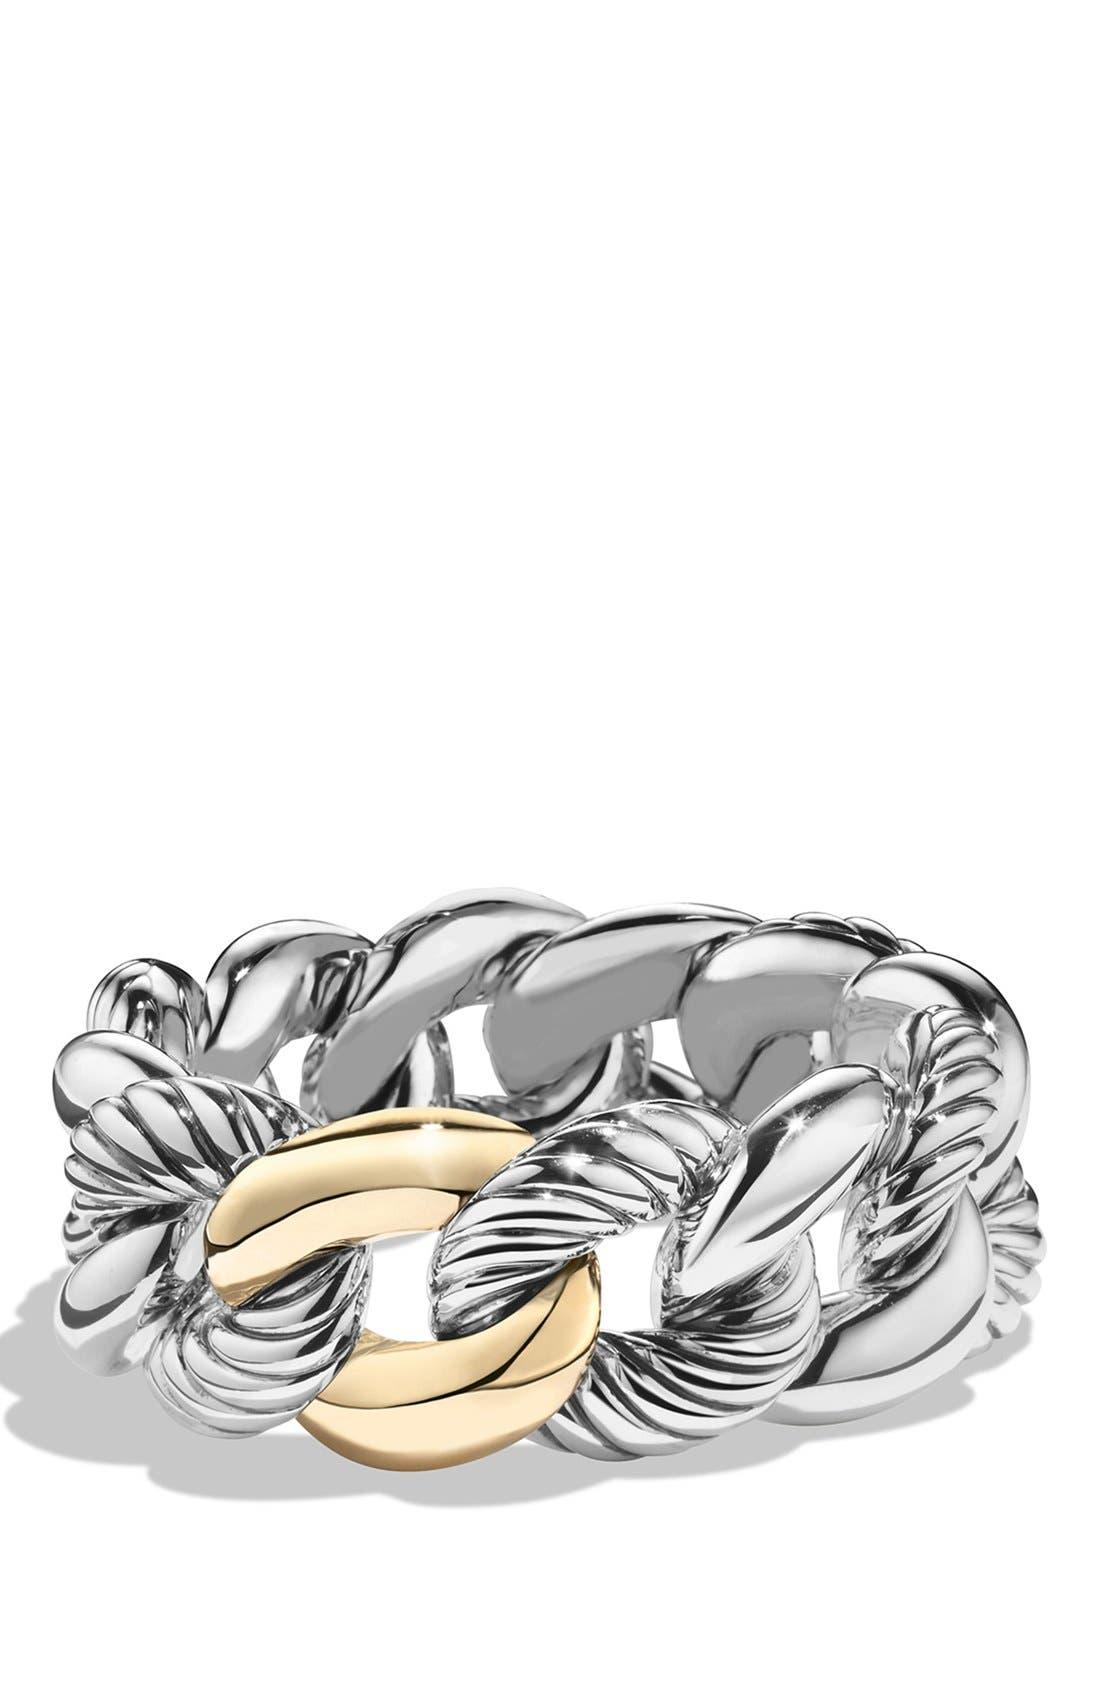 'Belmont' Curb Link Bracelet with 18K Gold,                             Main thumbnail 1, color,                             TWO TONE